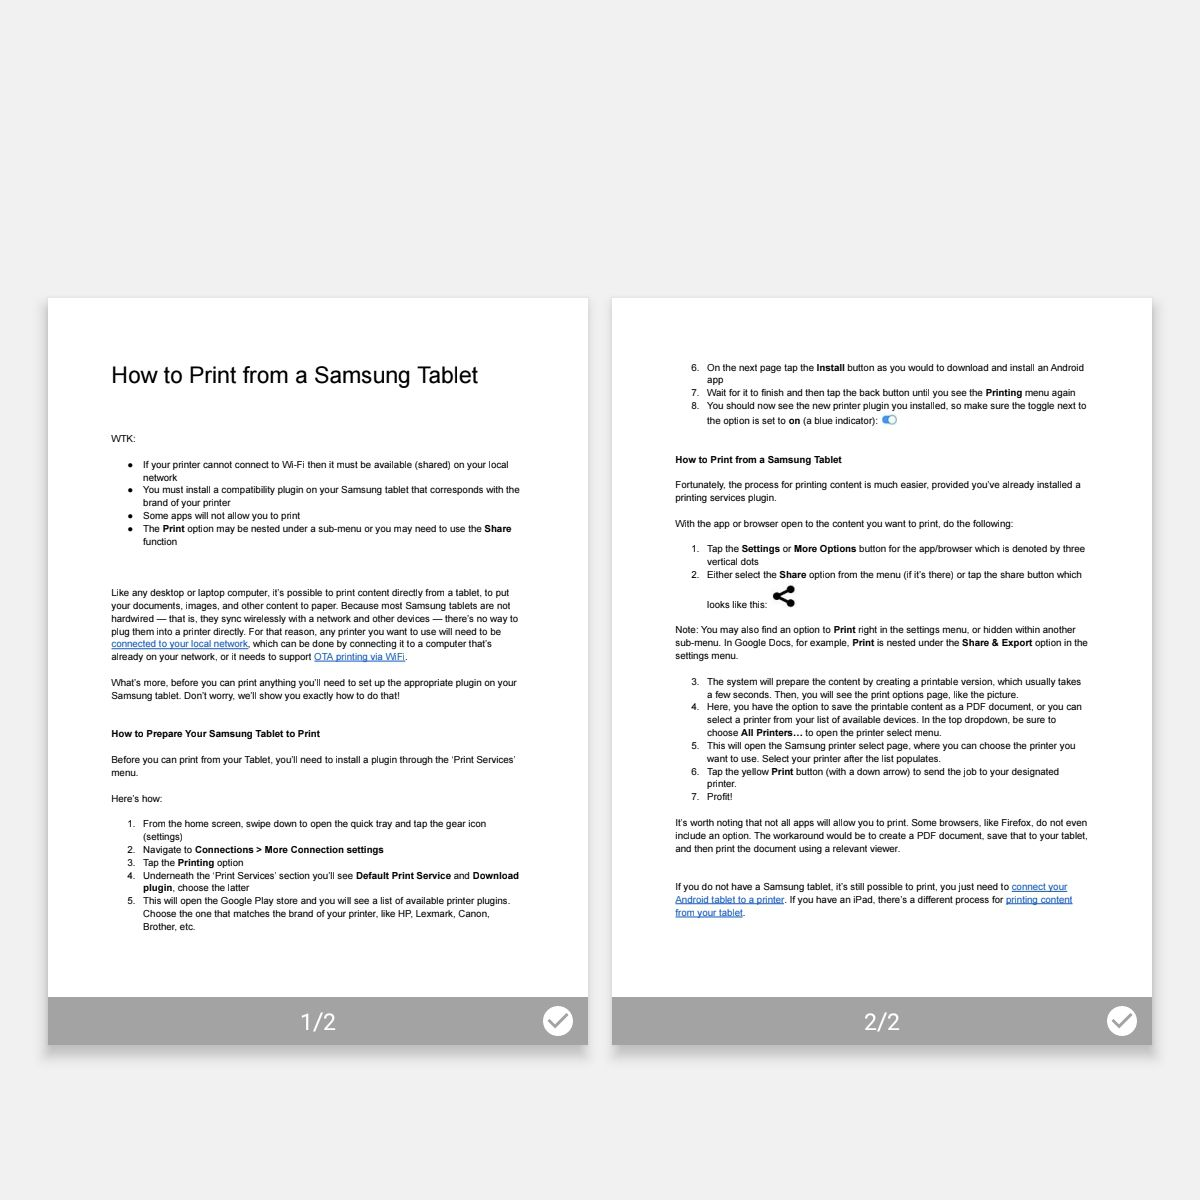 Samsung print preparation and options screen